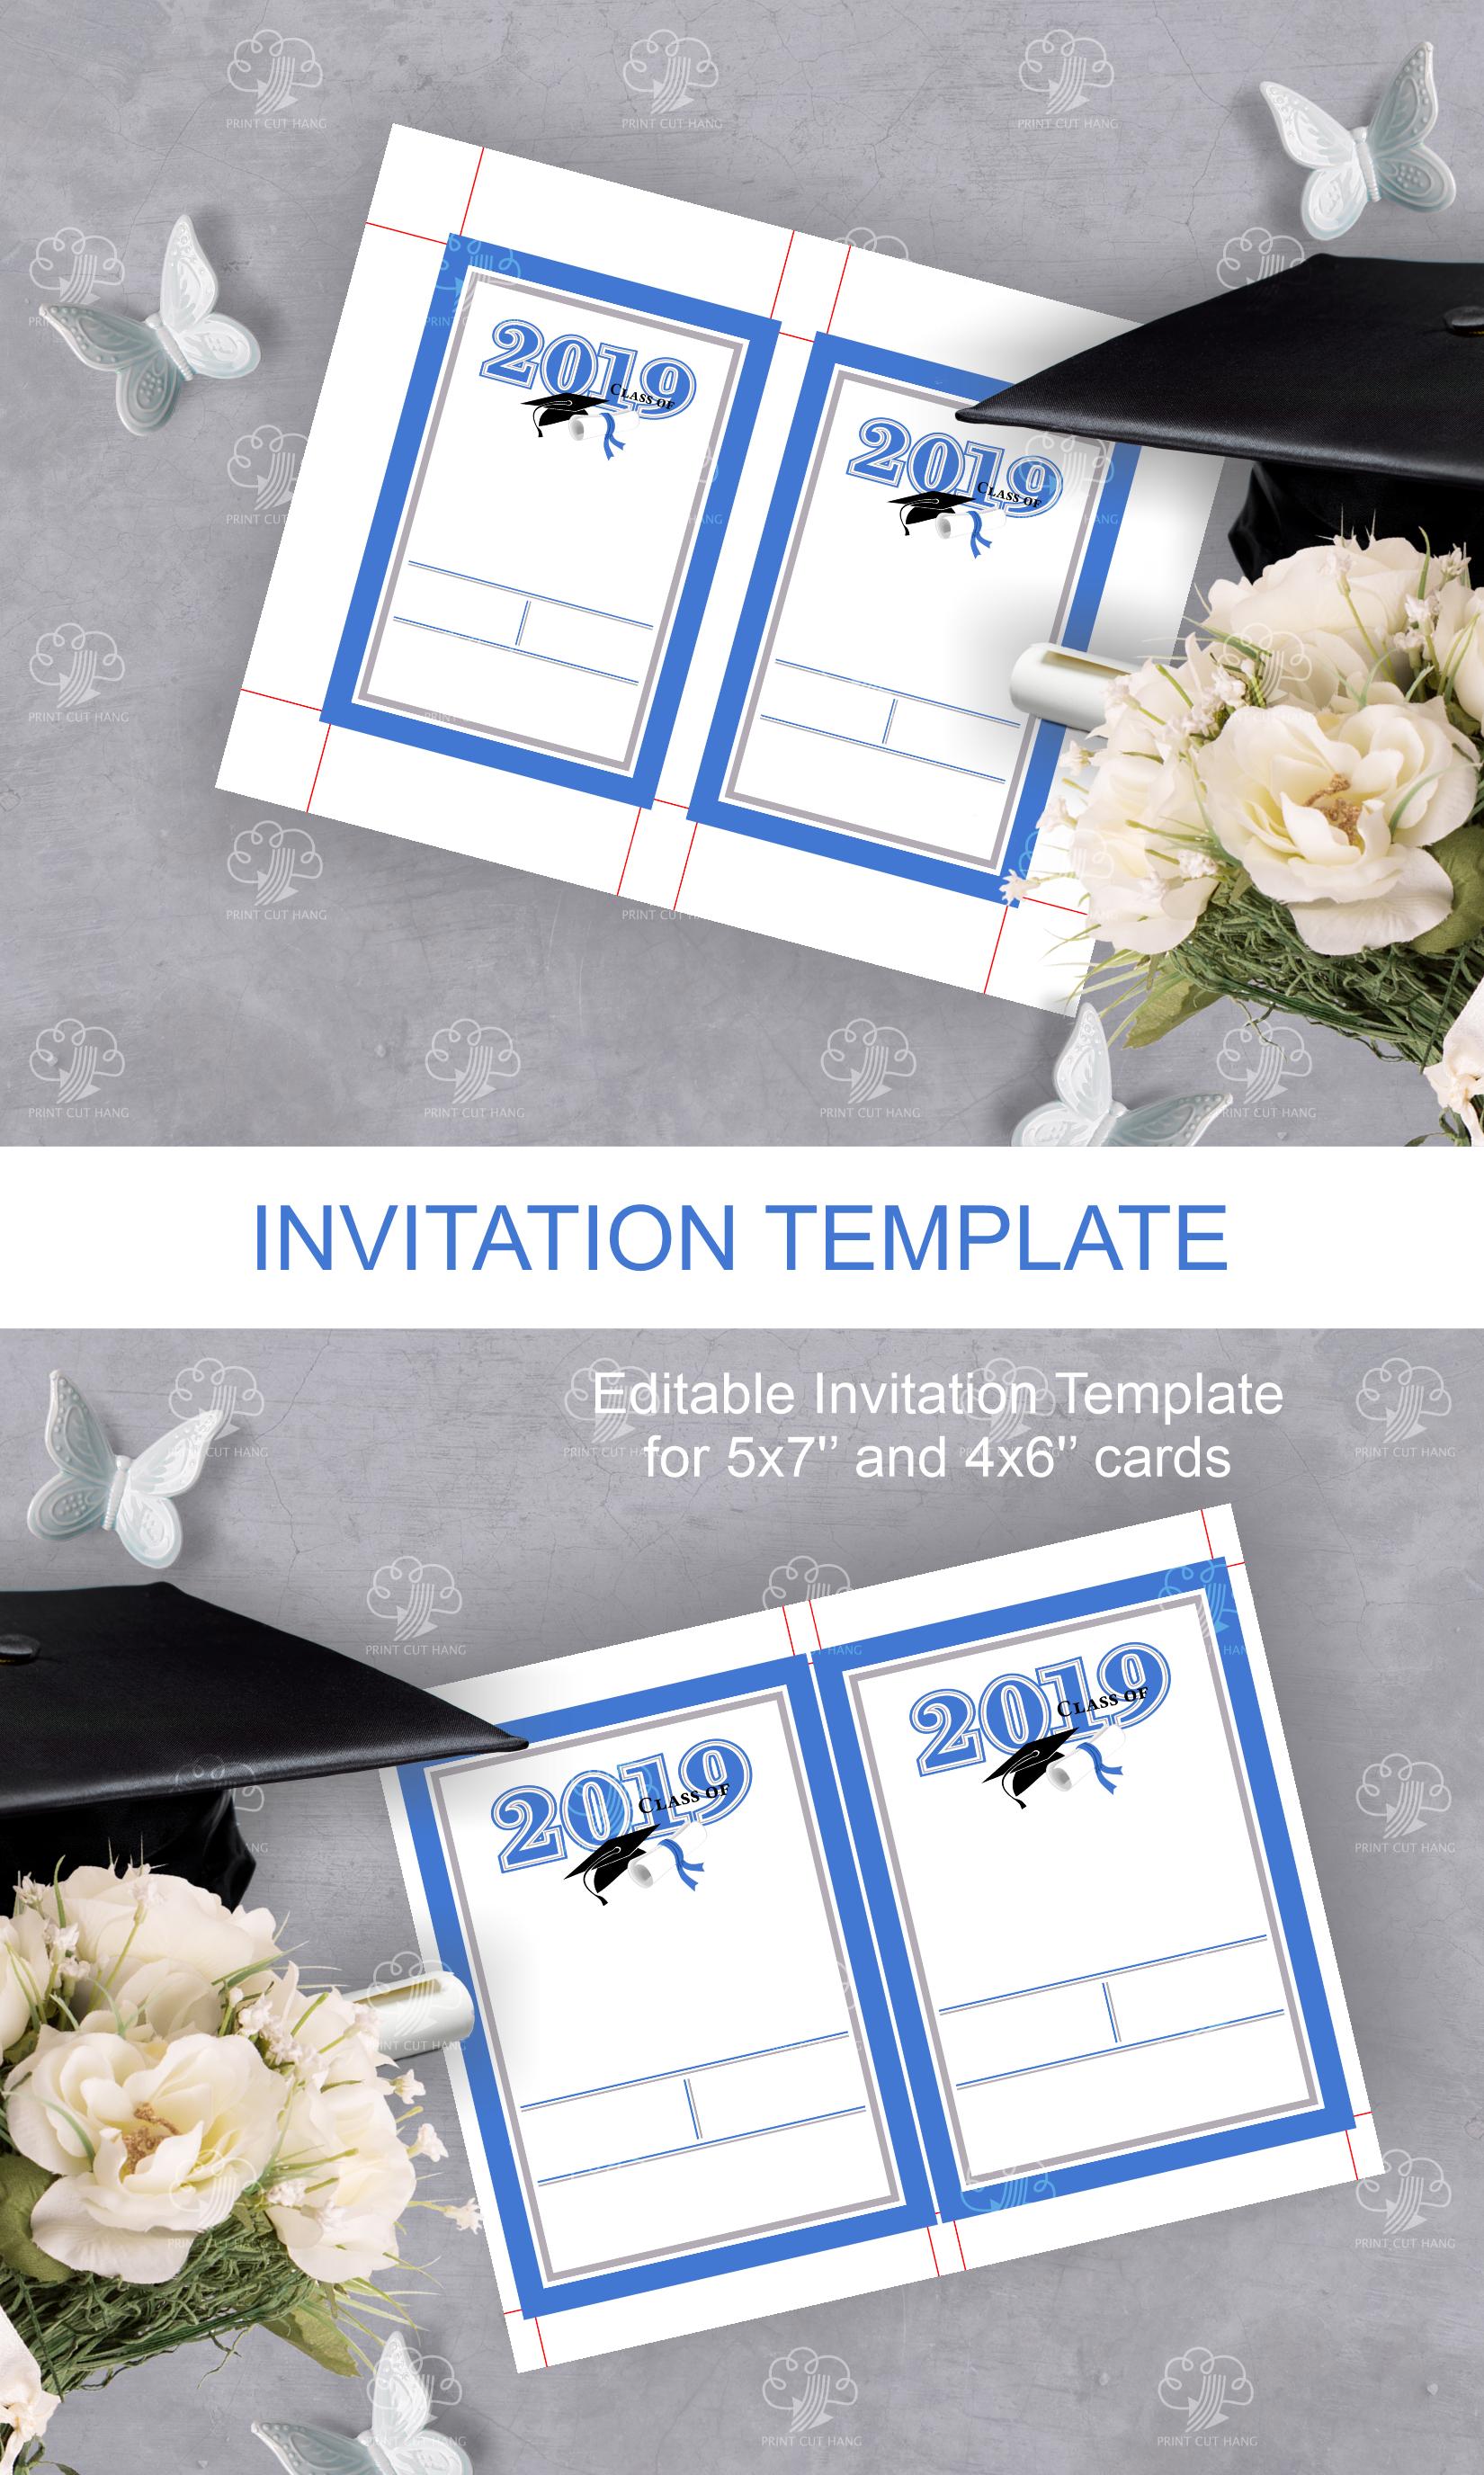 Invitation Template editable text - BLUE - Graduation 2019 example image 5